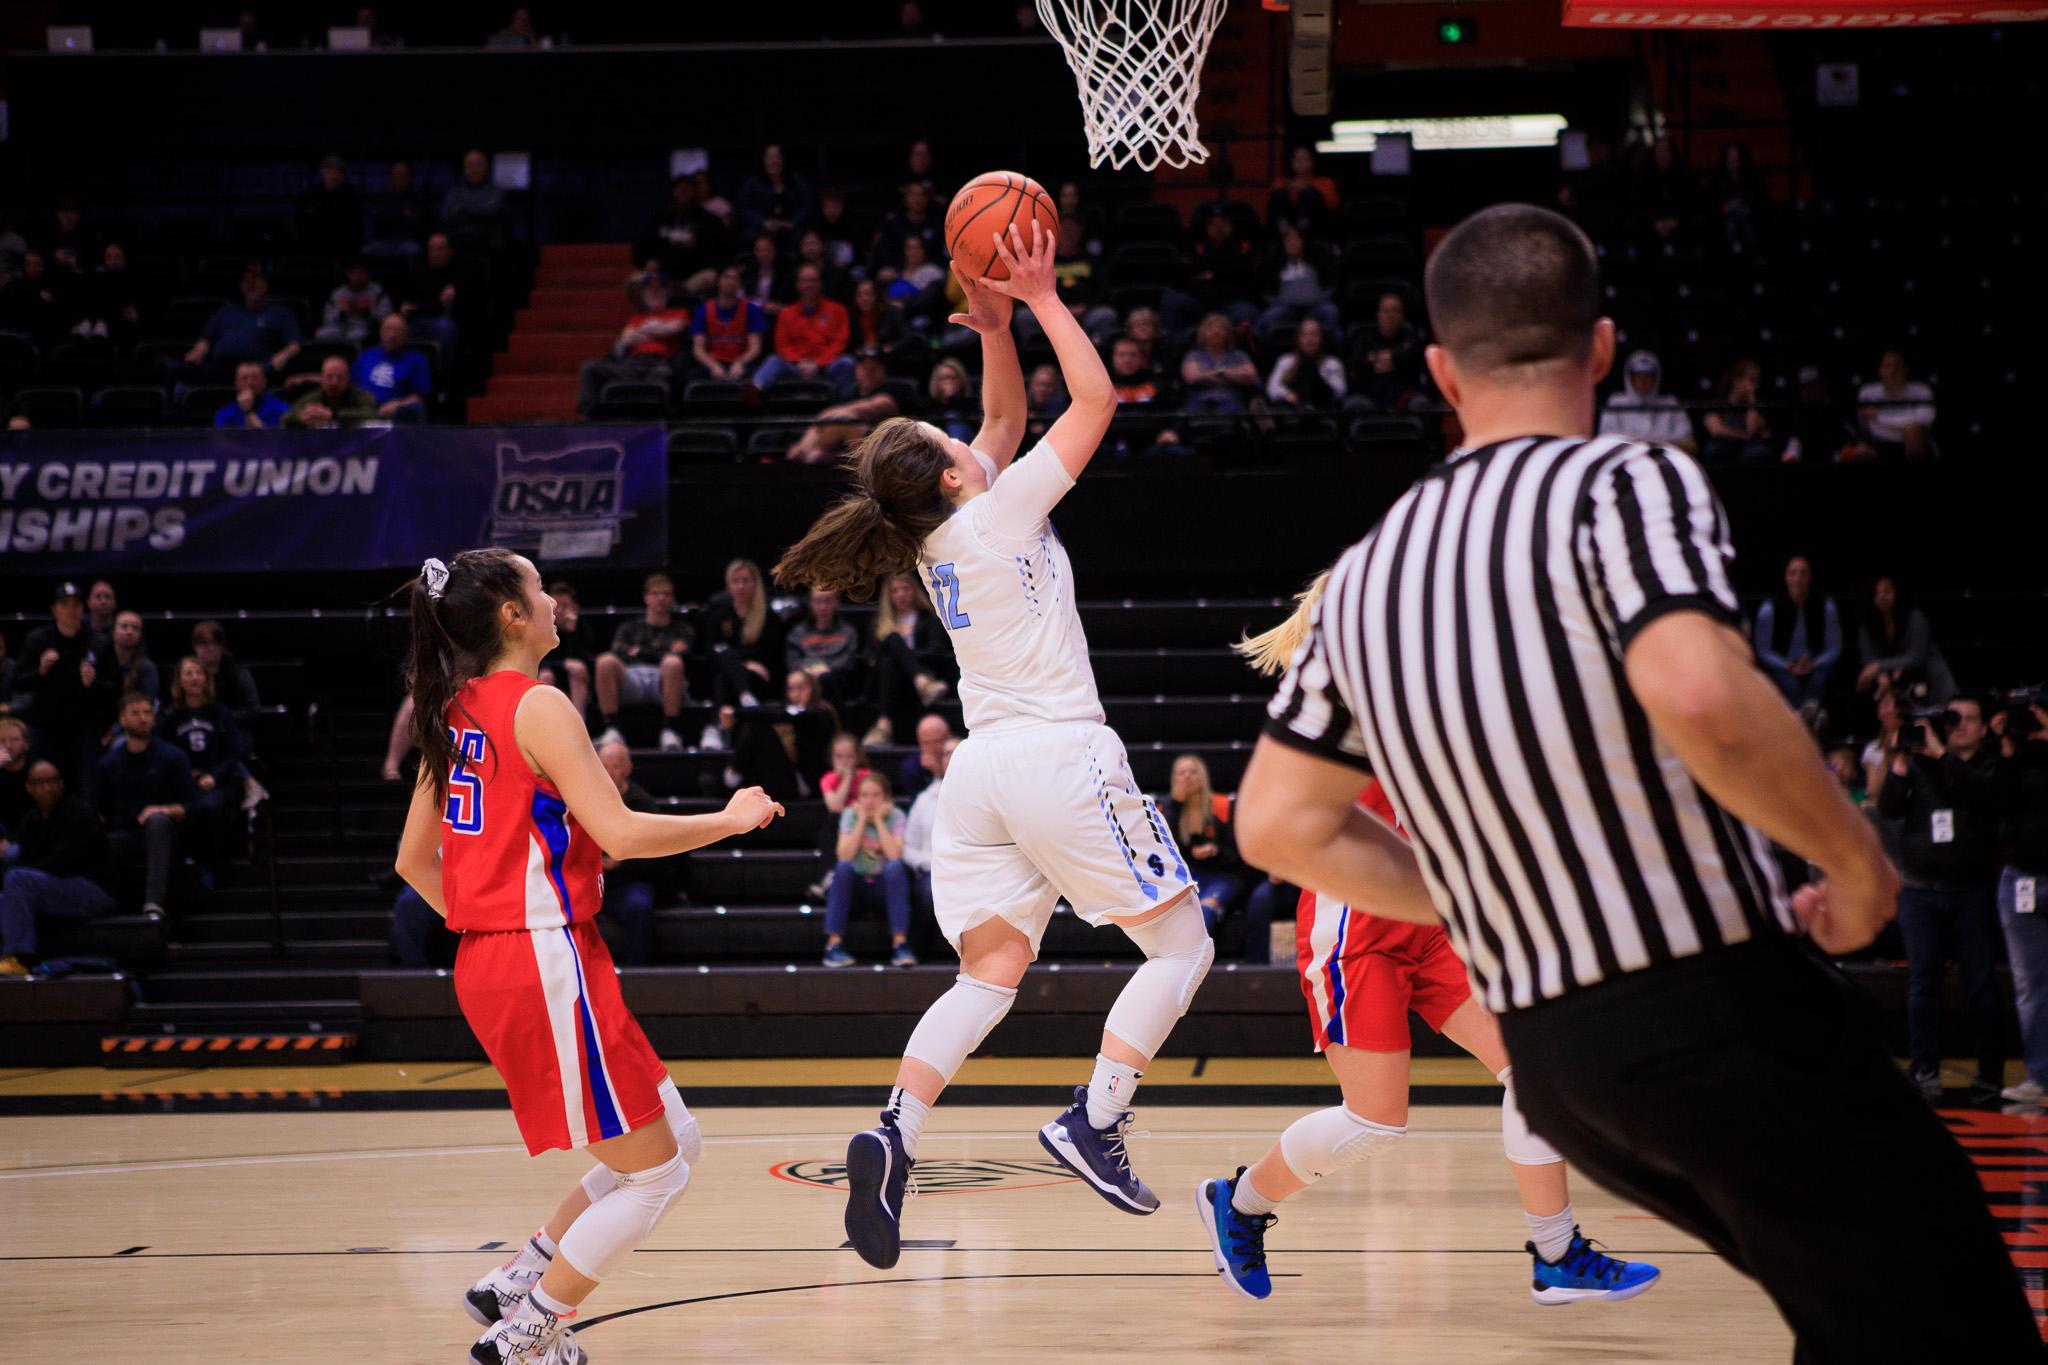 State Championship Game: Girls Basketball falls to La Salle  55 – 48